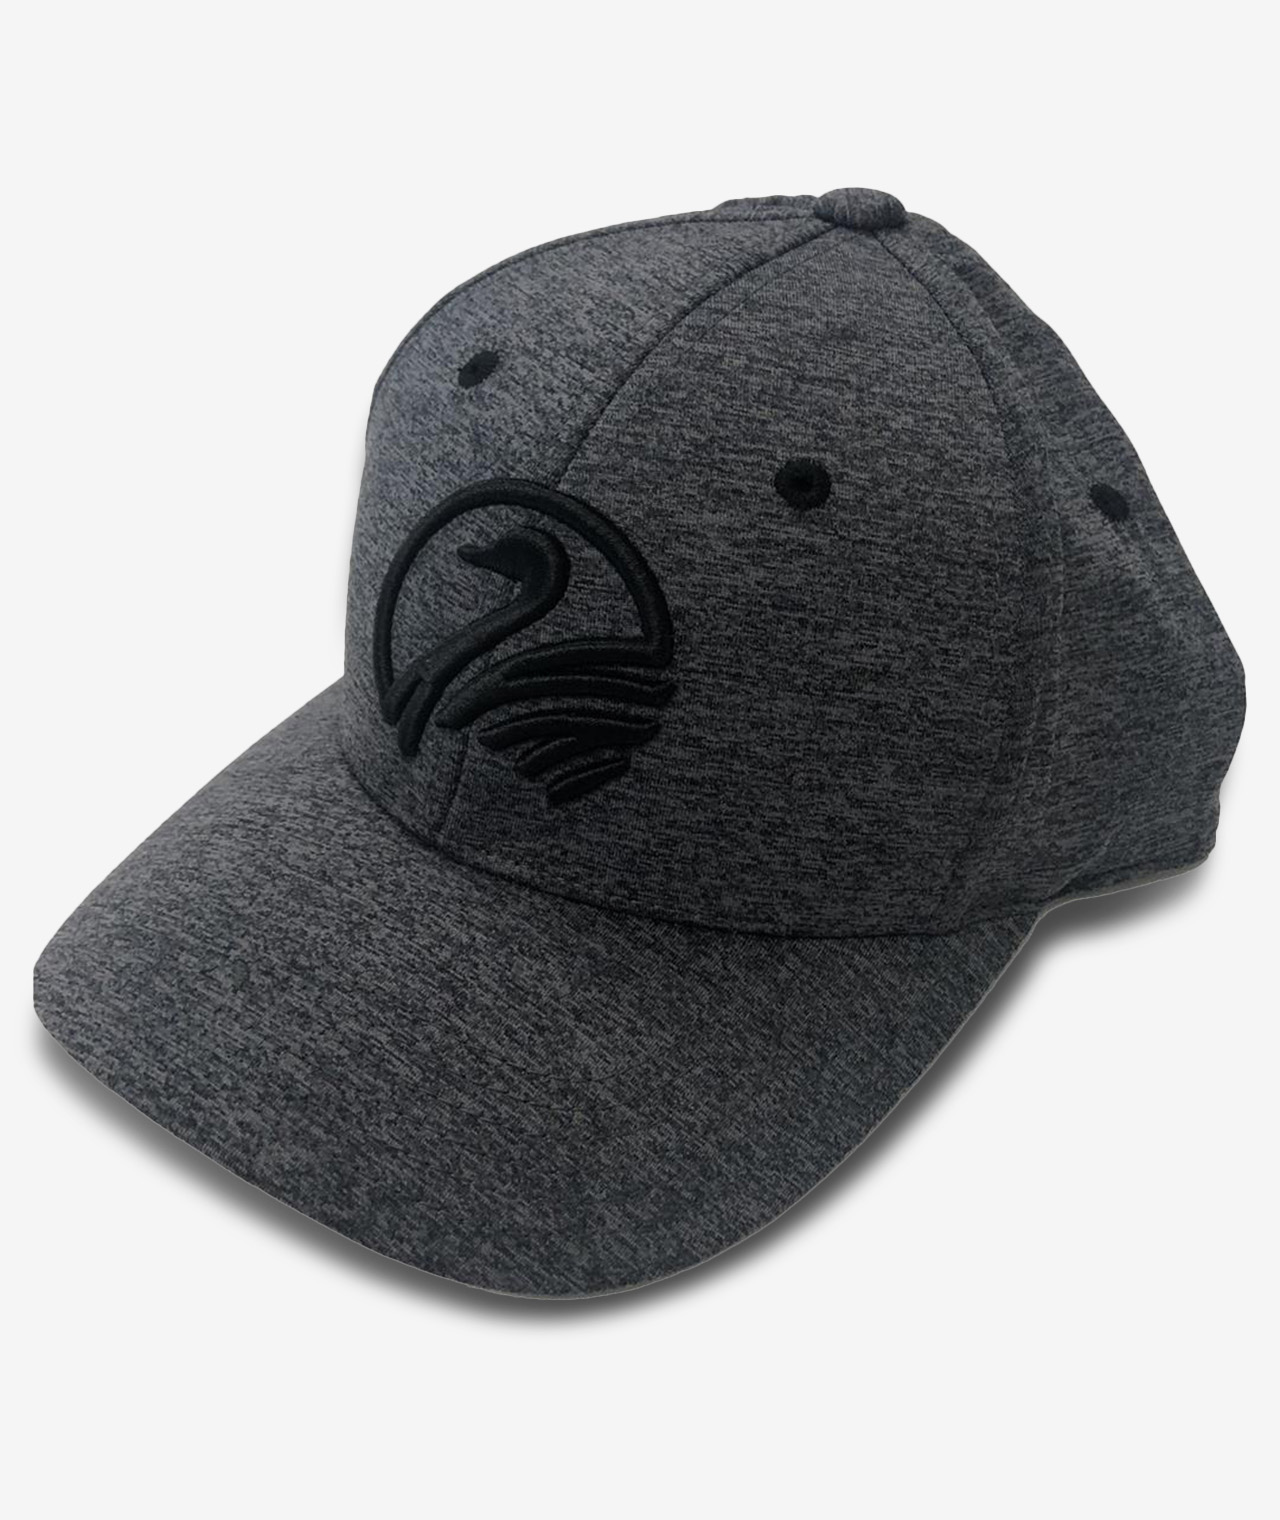 Swanndri Sportback Cap